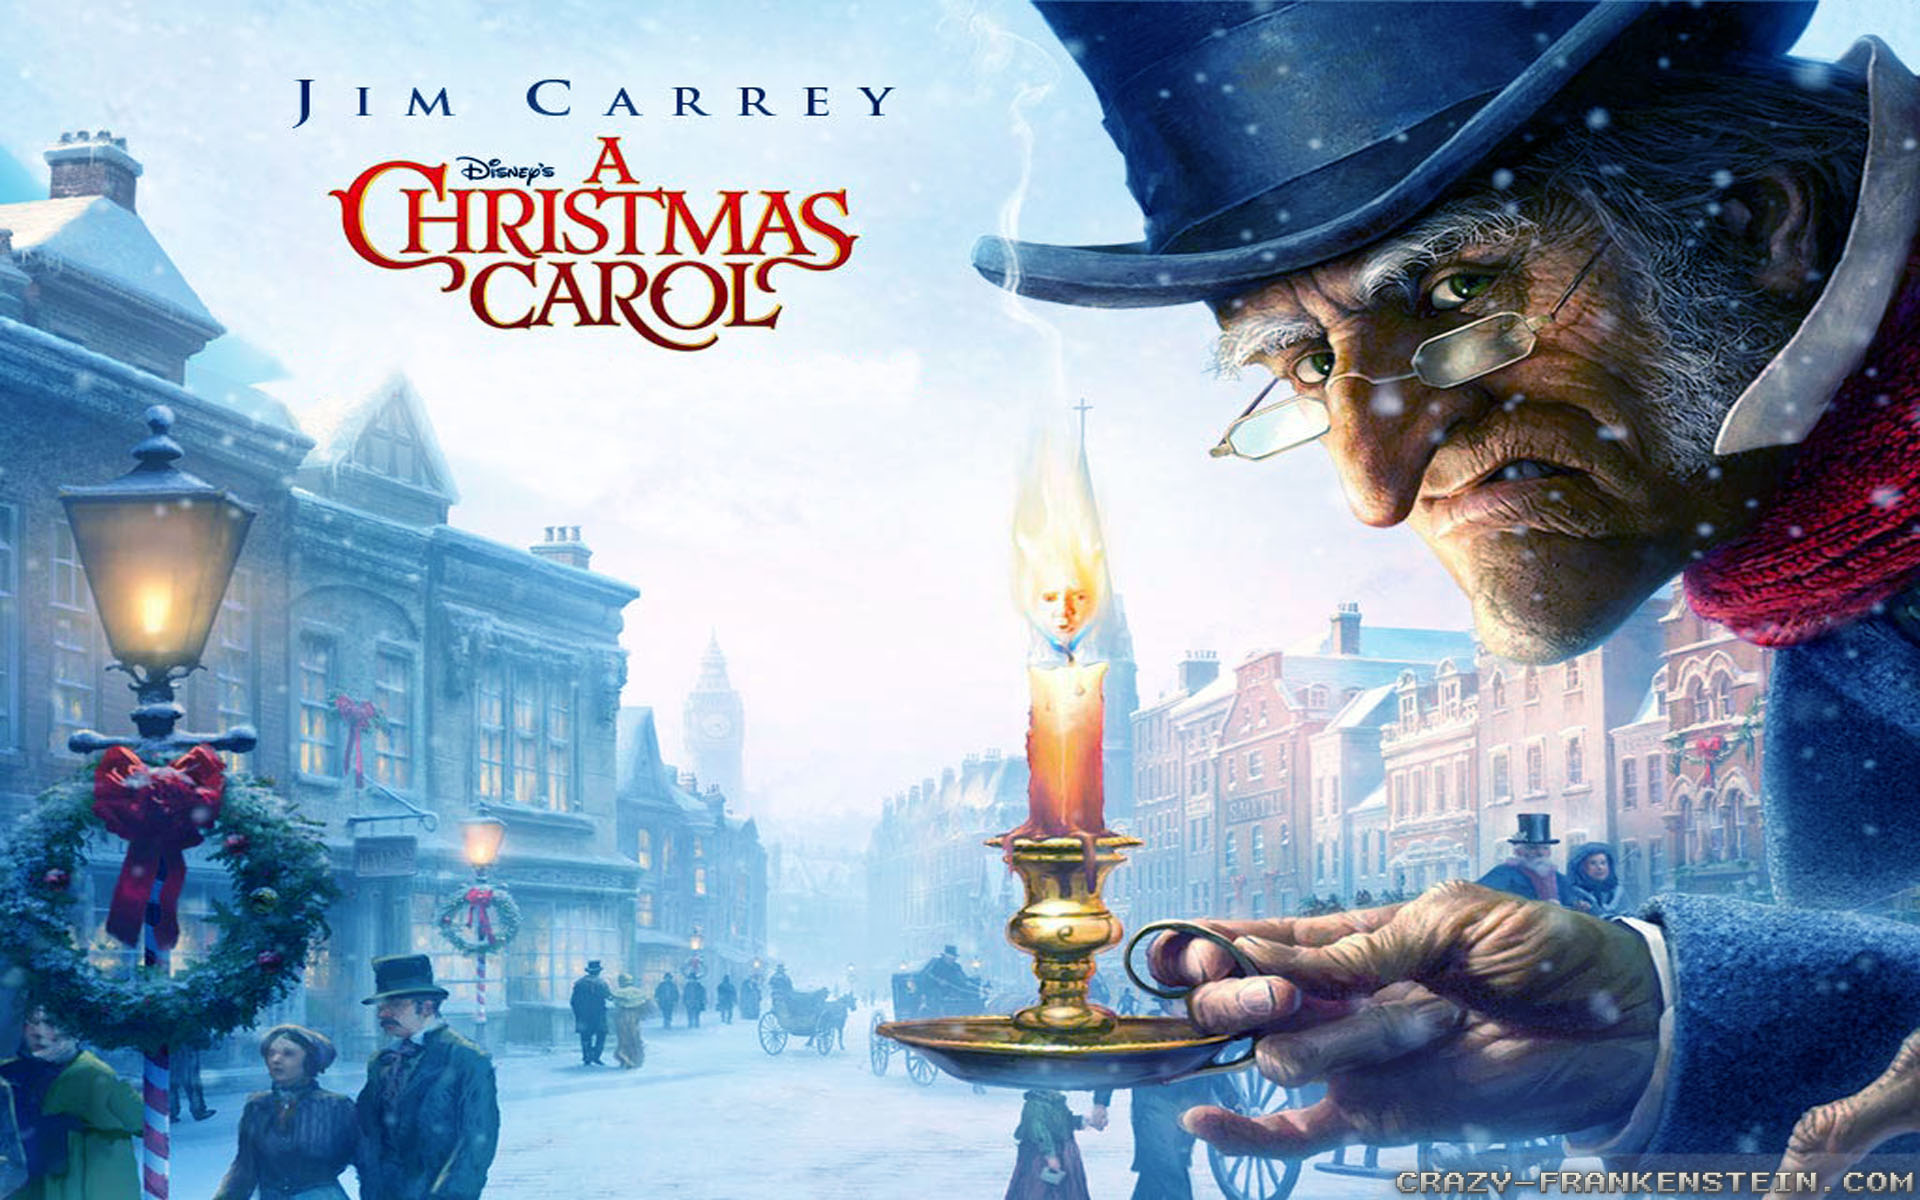 Christmas Carols Movie.A Christmas Carol Wallpapers Movie Hq A Christmas Carol